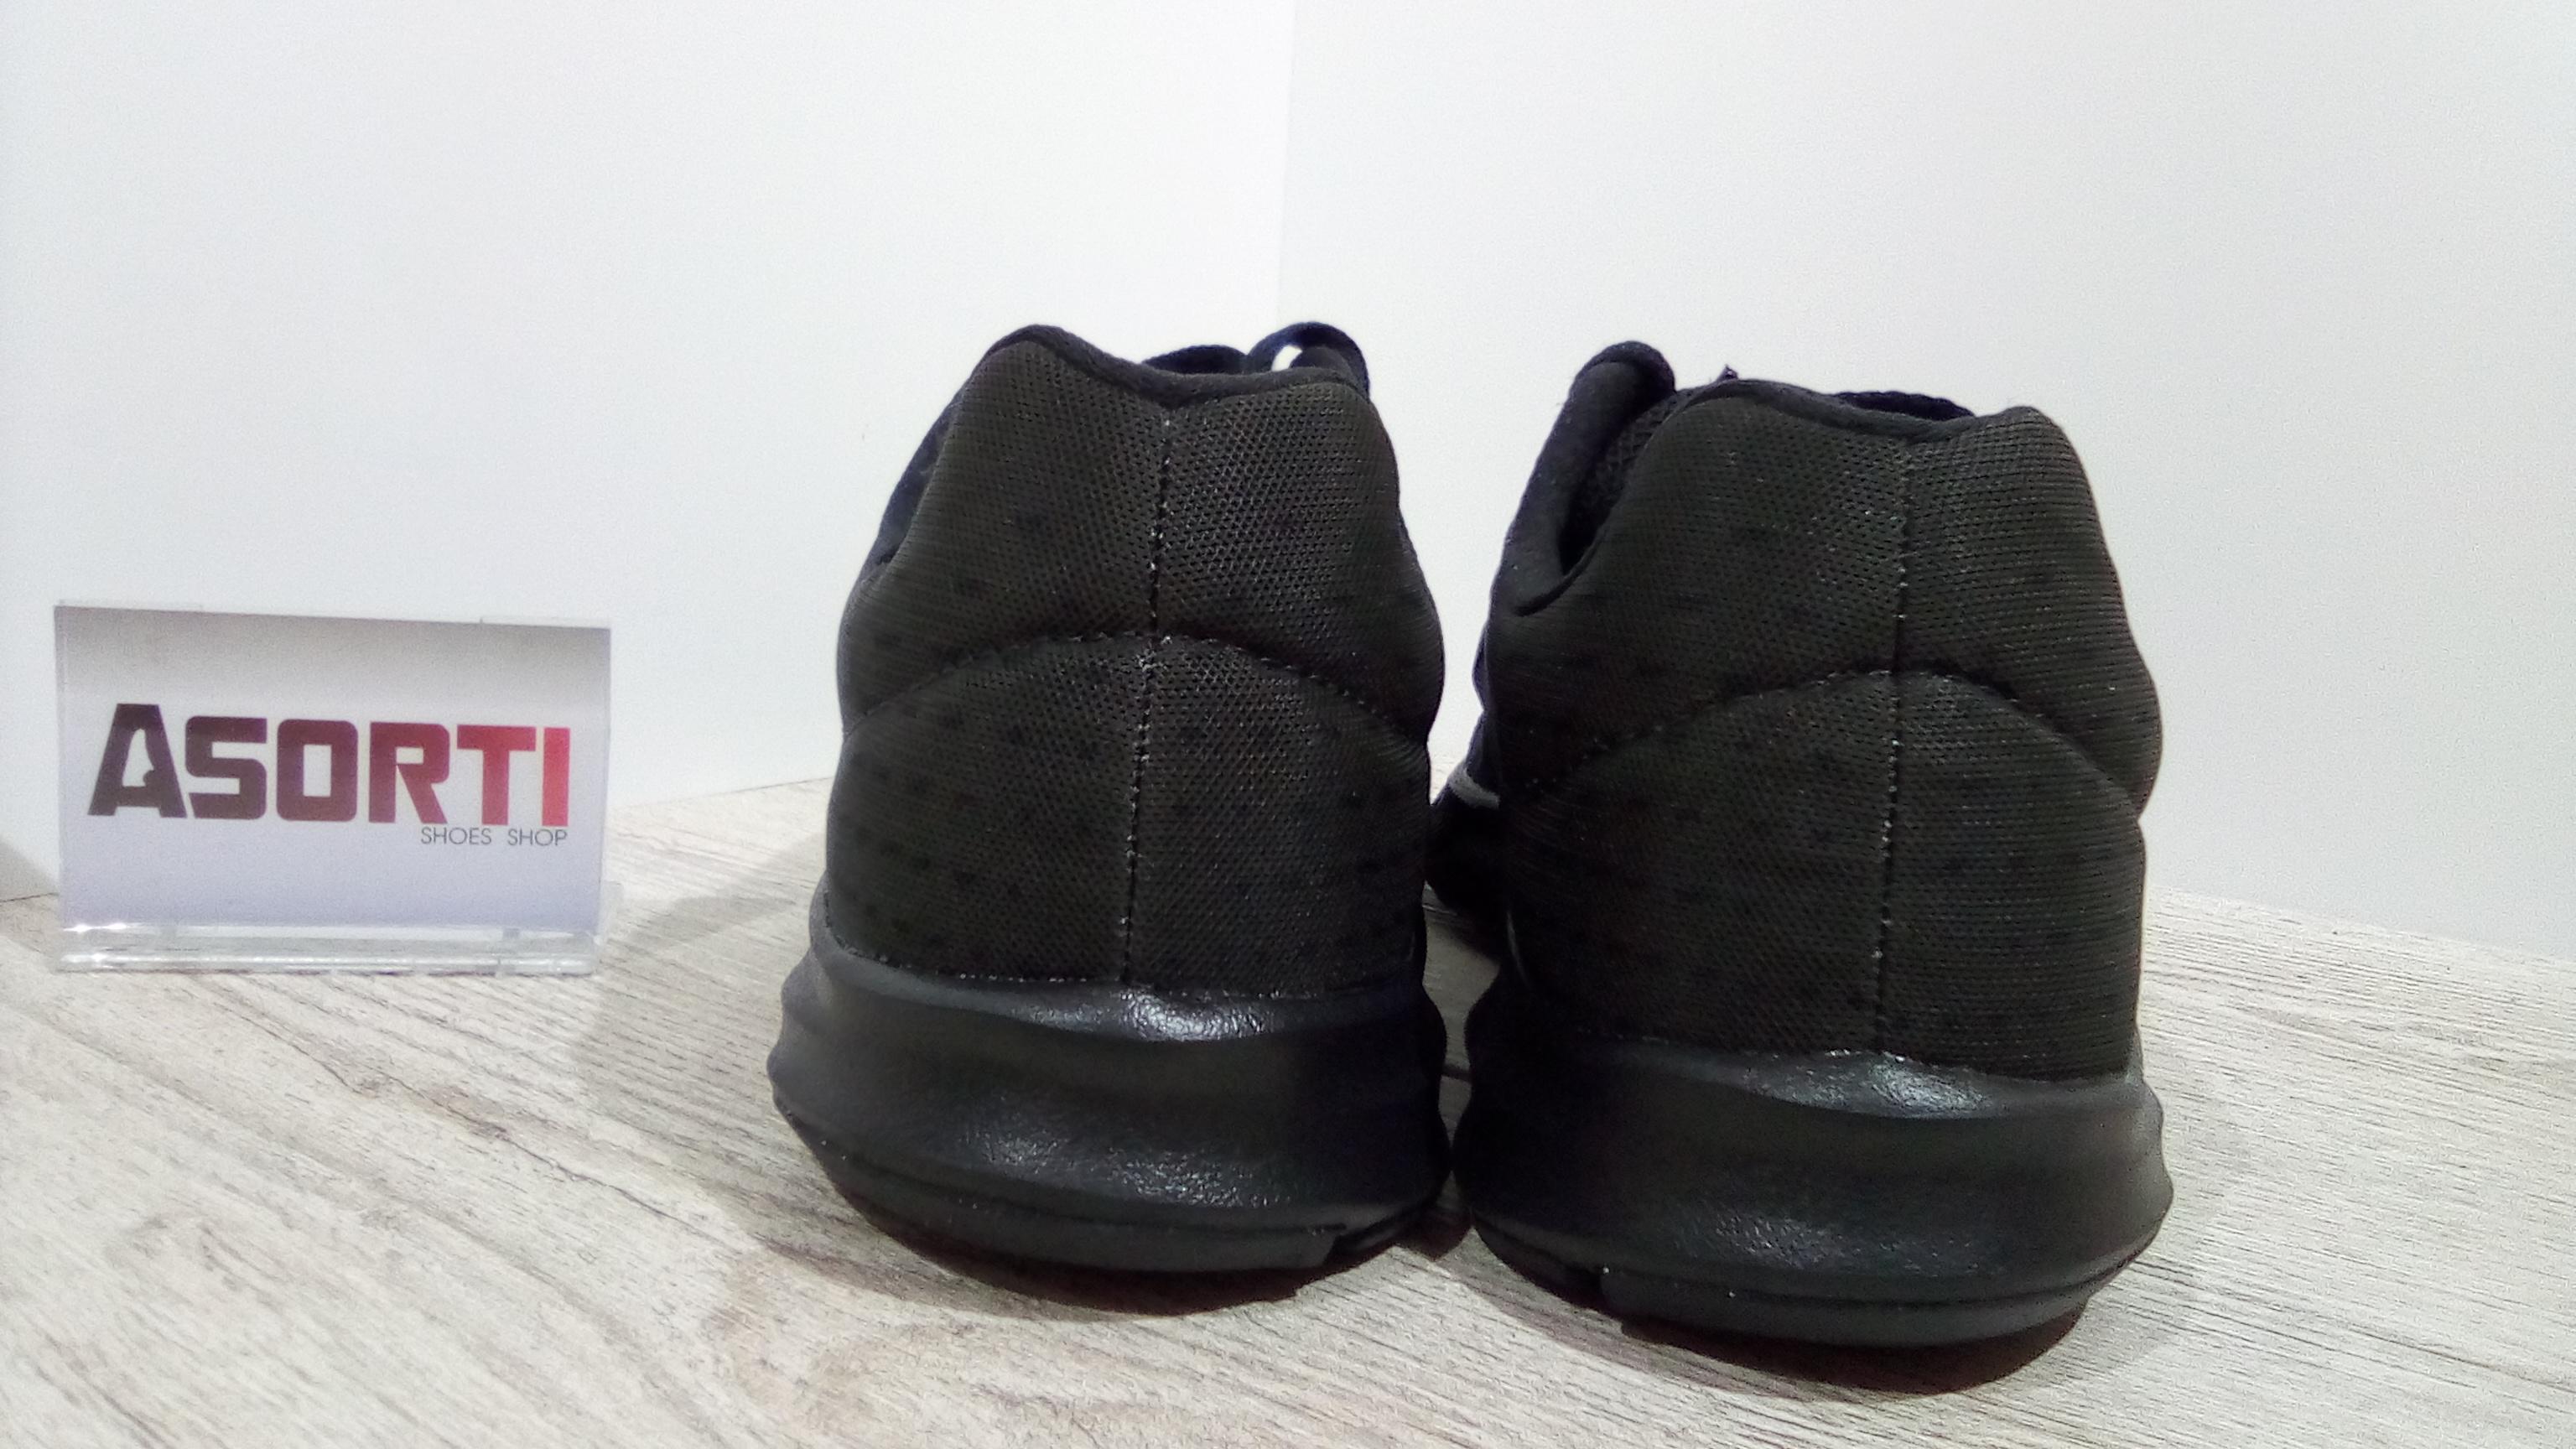 861690ae Мужские беговые кроссовки Nike Downshifter 8 (908984-002) черные. Мужские  ...